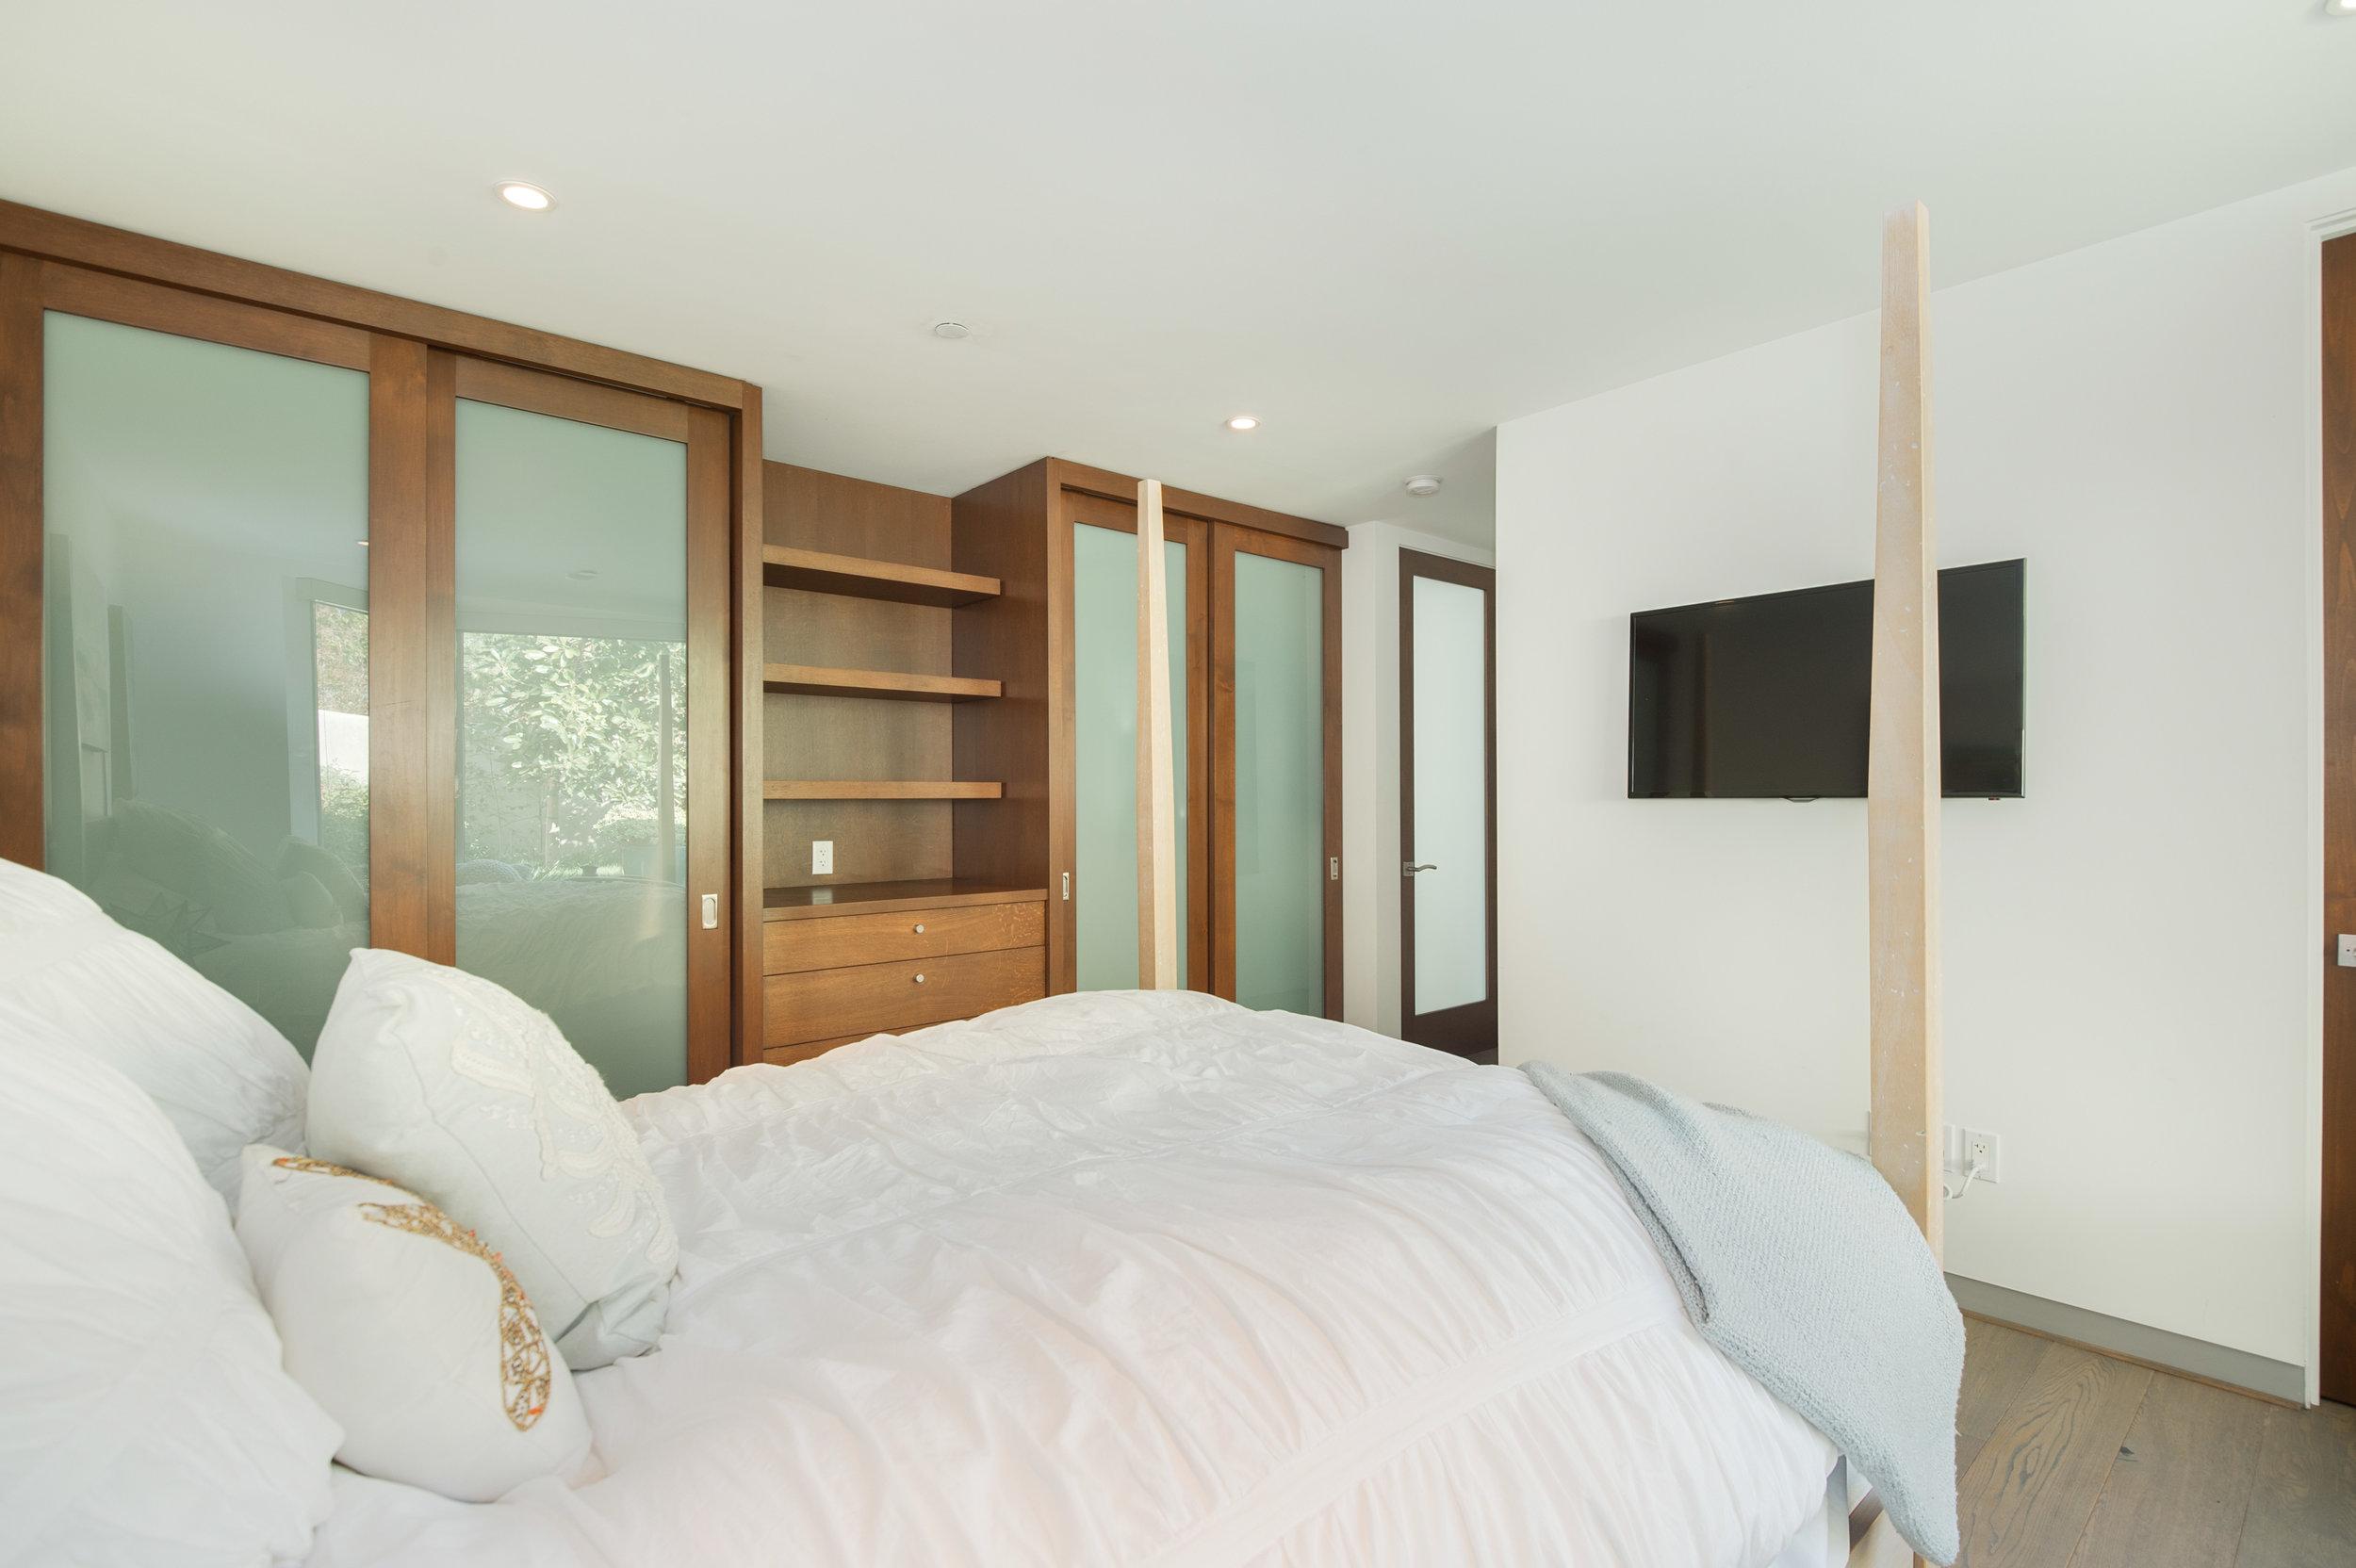 Copy of 012.3 Bedroom 20729 Eaglepass For Sale Lease The Malibu Life Team Luxury Real Estate.jpg